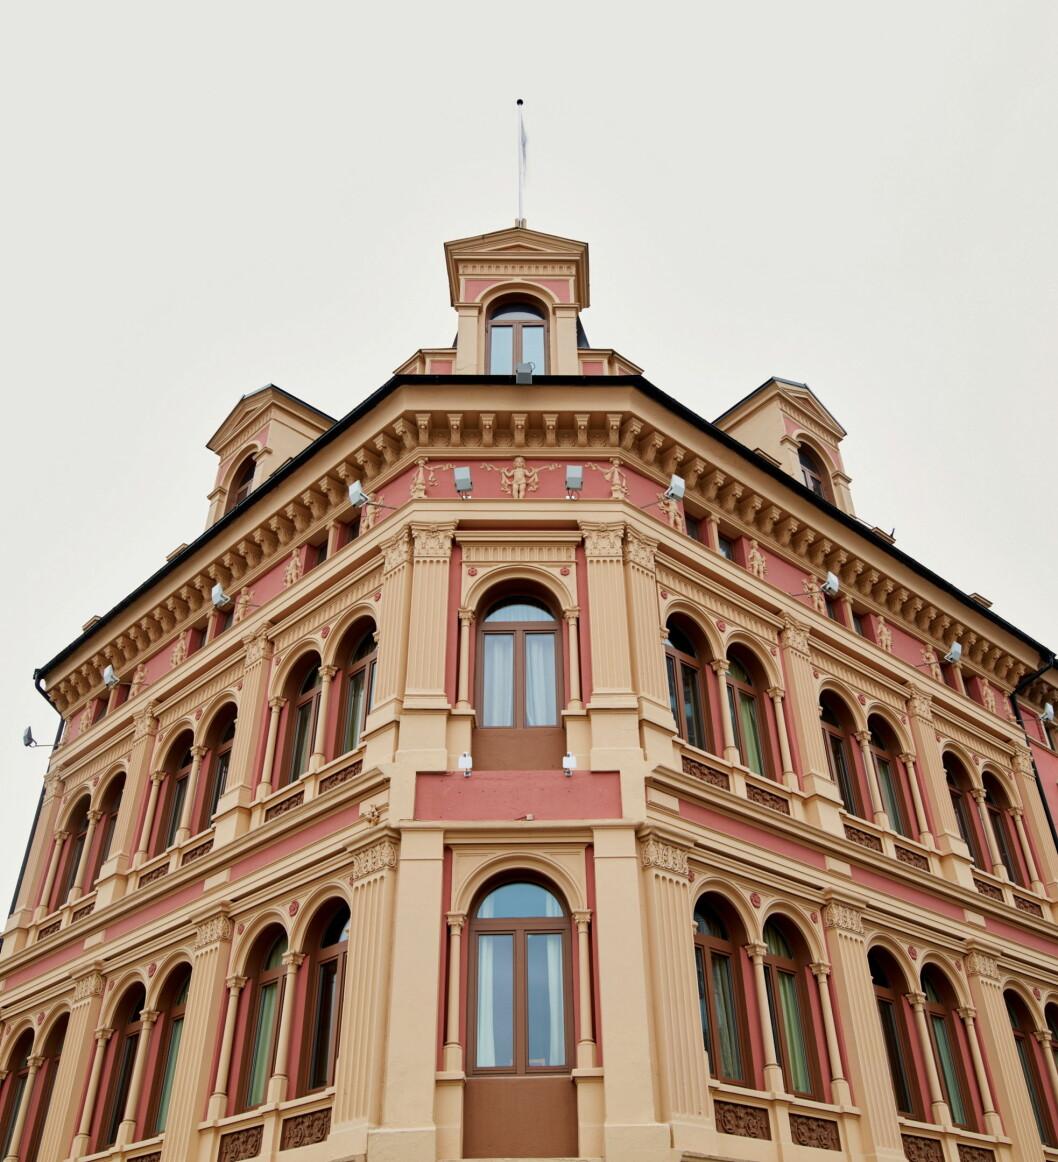 Ambassadeur Hotel blir 1. januar til Scandic Ambassadeur Hotel Drammen.